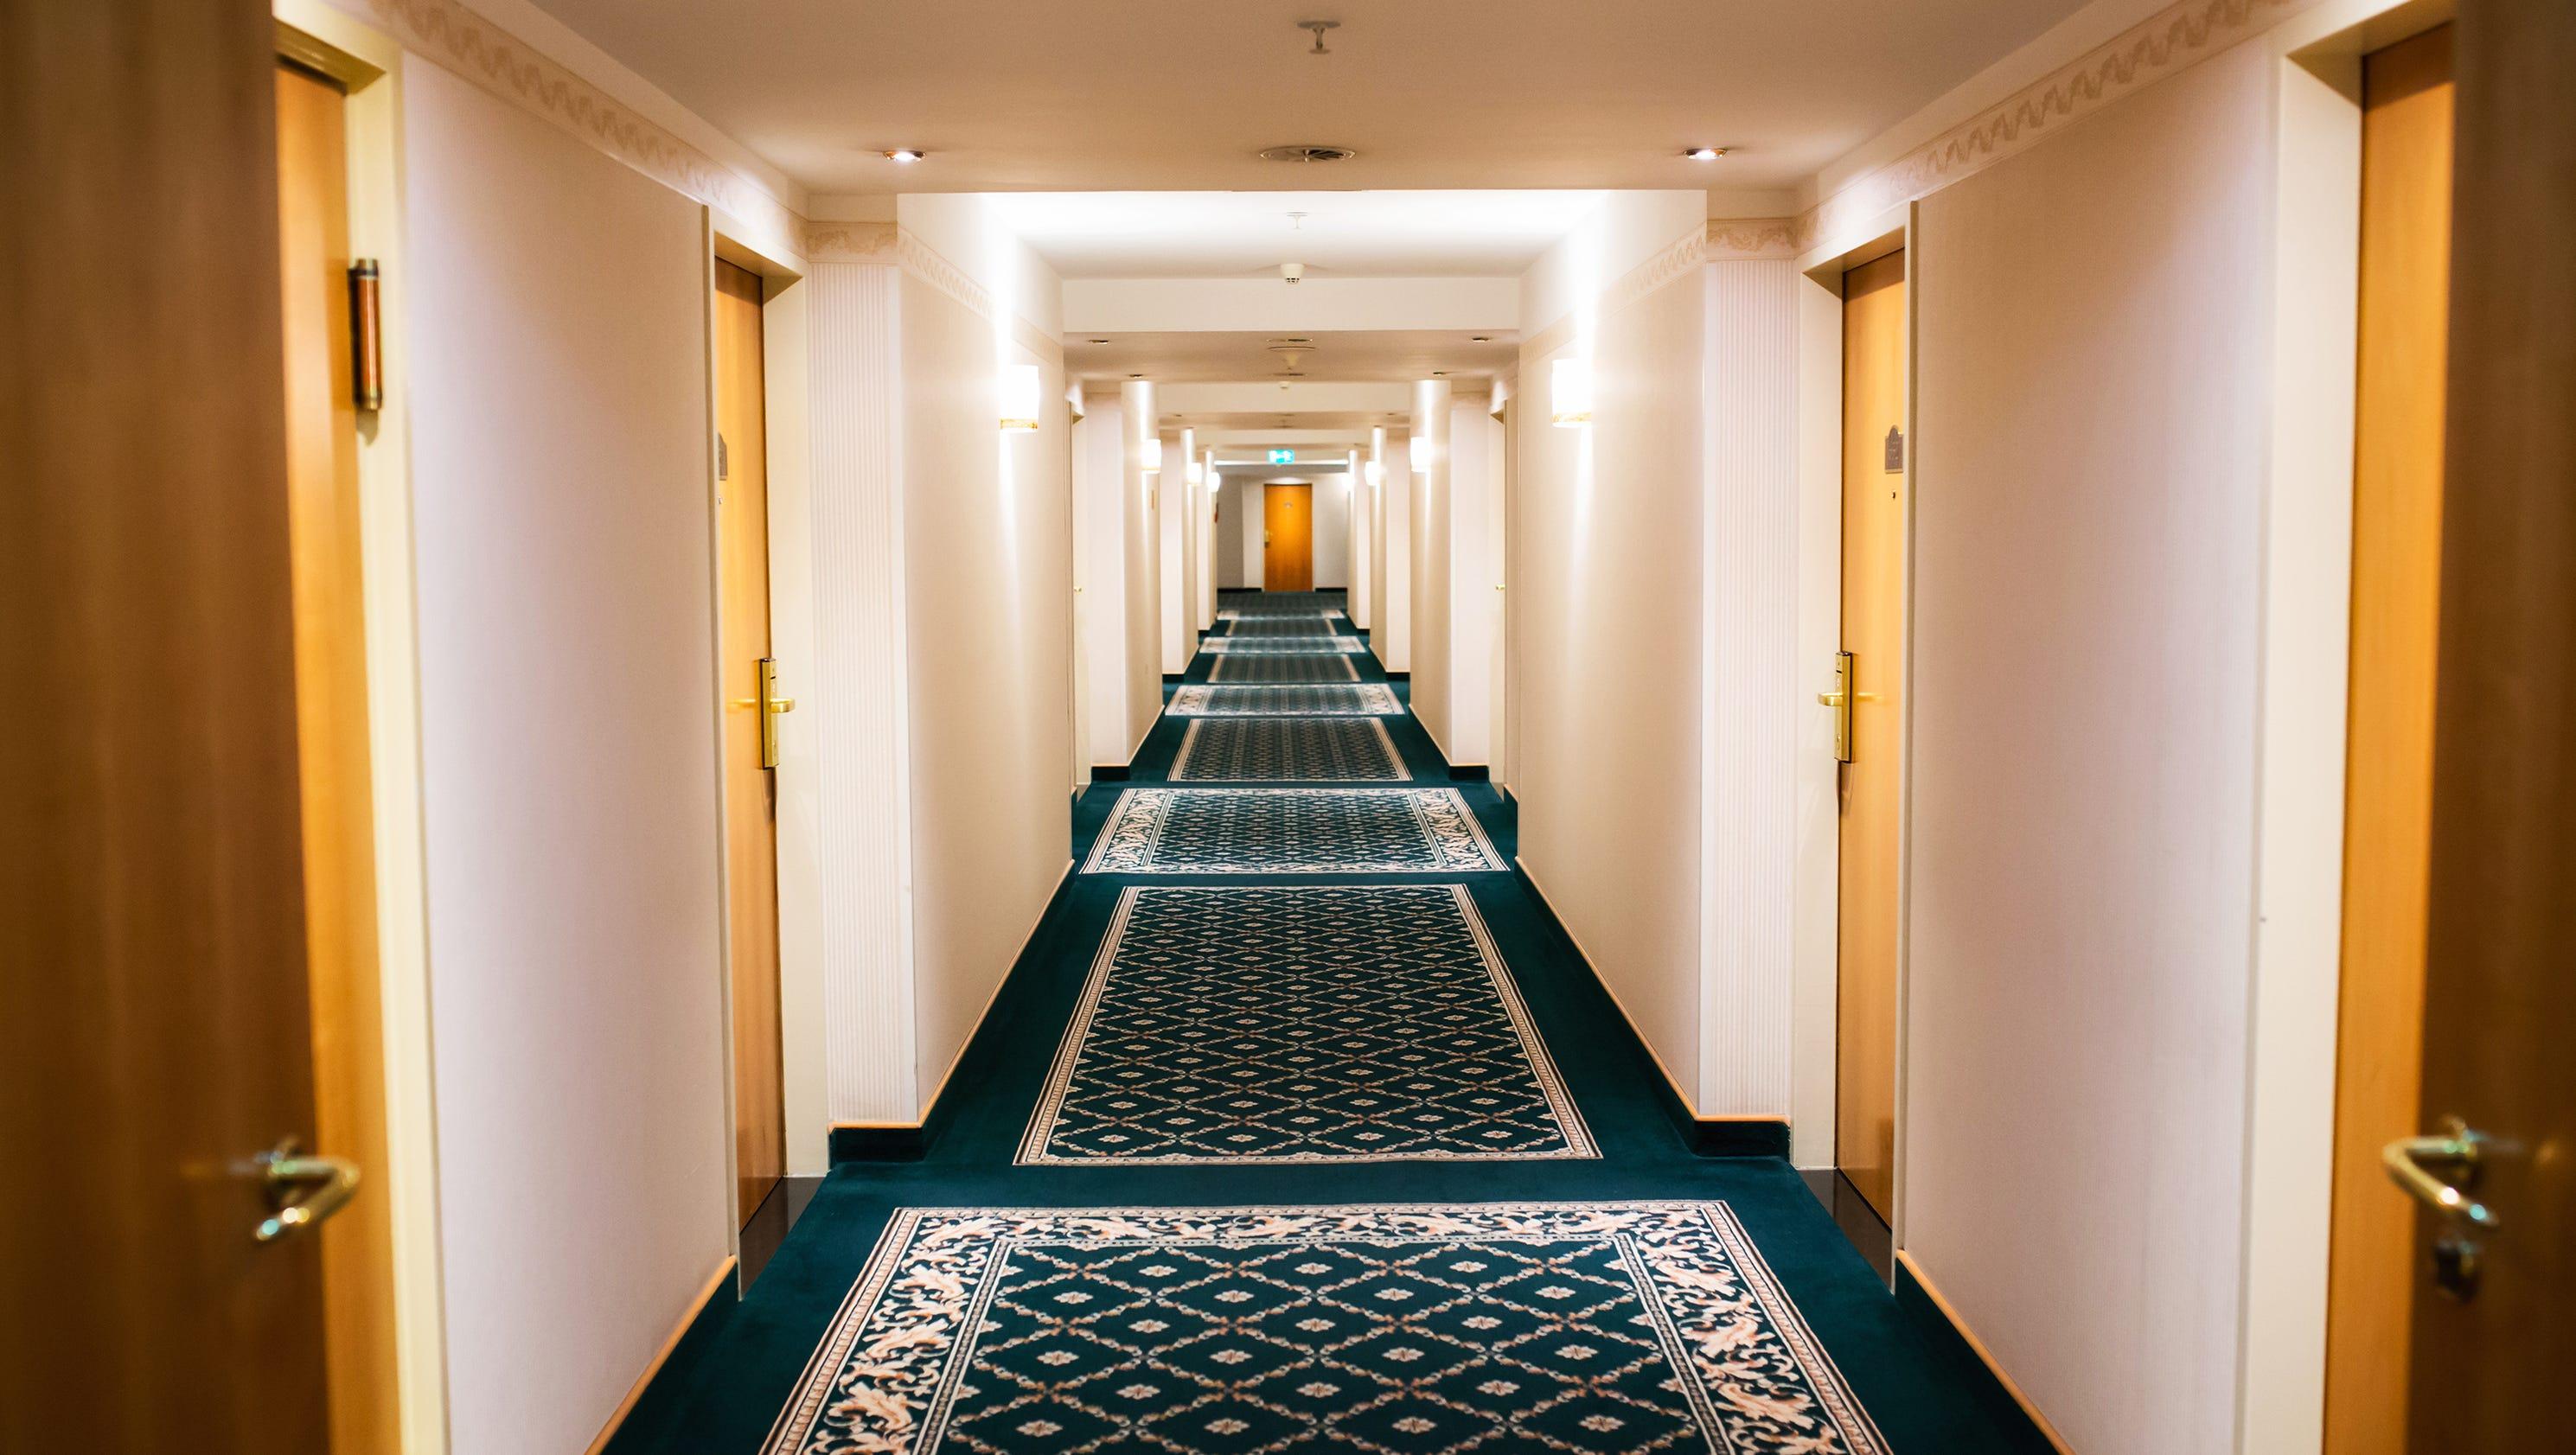 Should I Book A Hotel Room Already